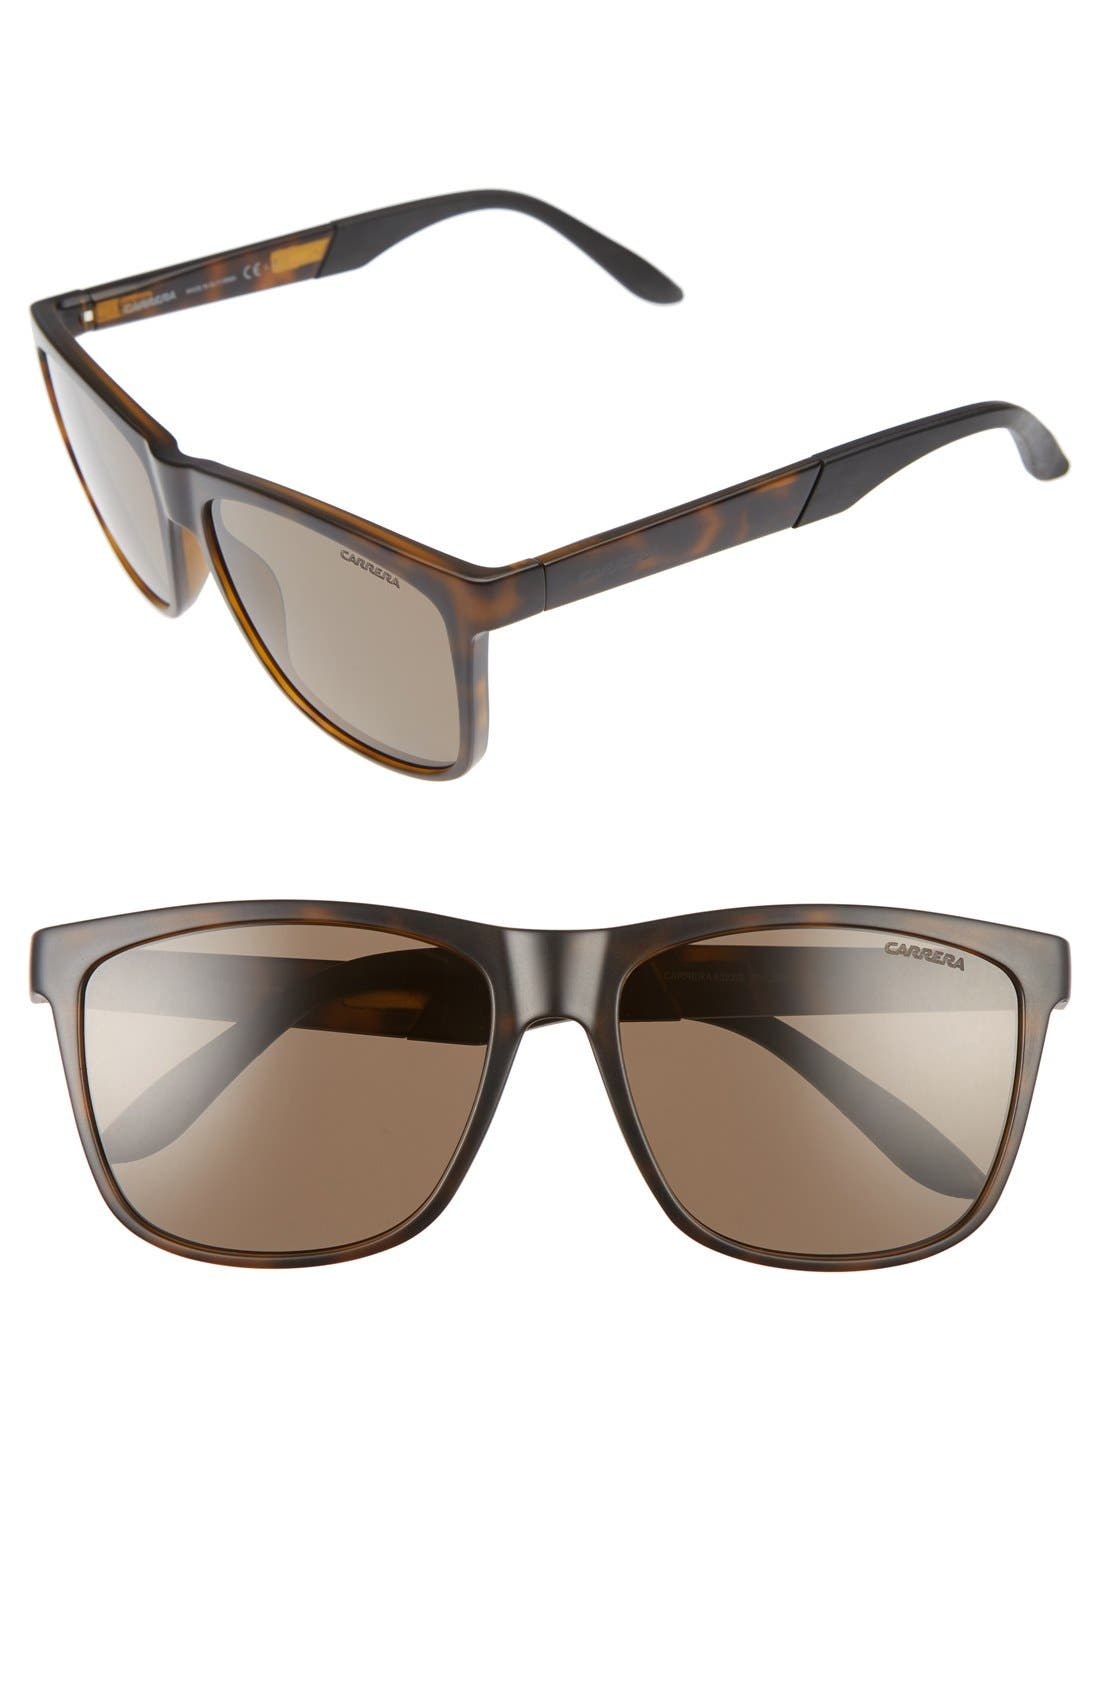 CARRERA EYEWEAR,                             8022/S 56mm Polarized Sunglasses,                             Main thumbnail 1, color,                             HAVANA